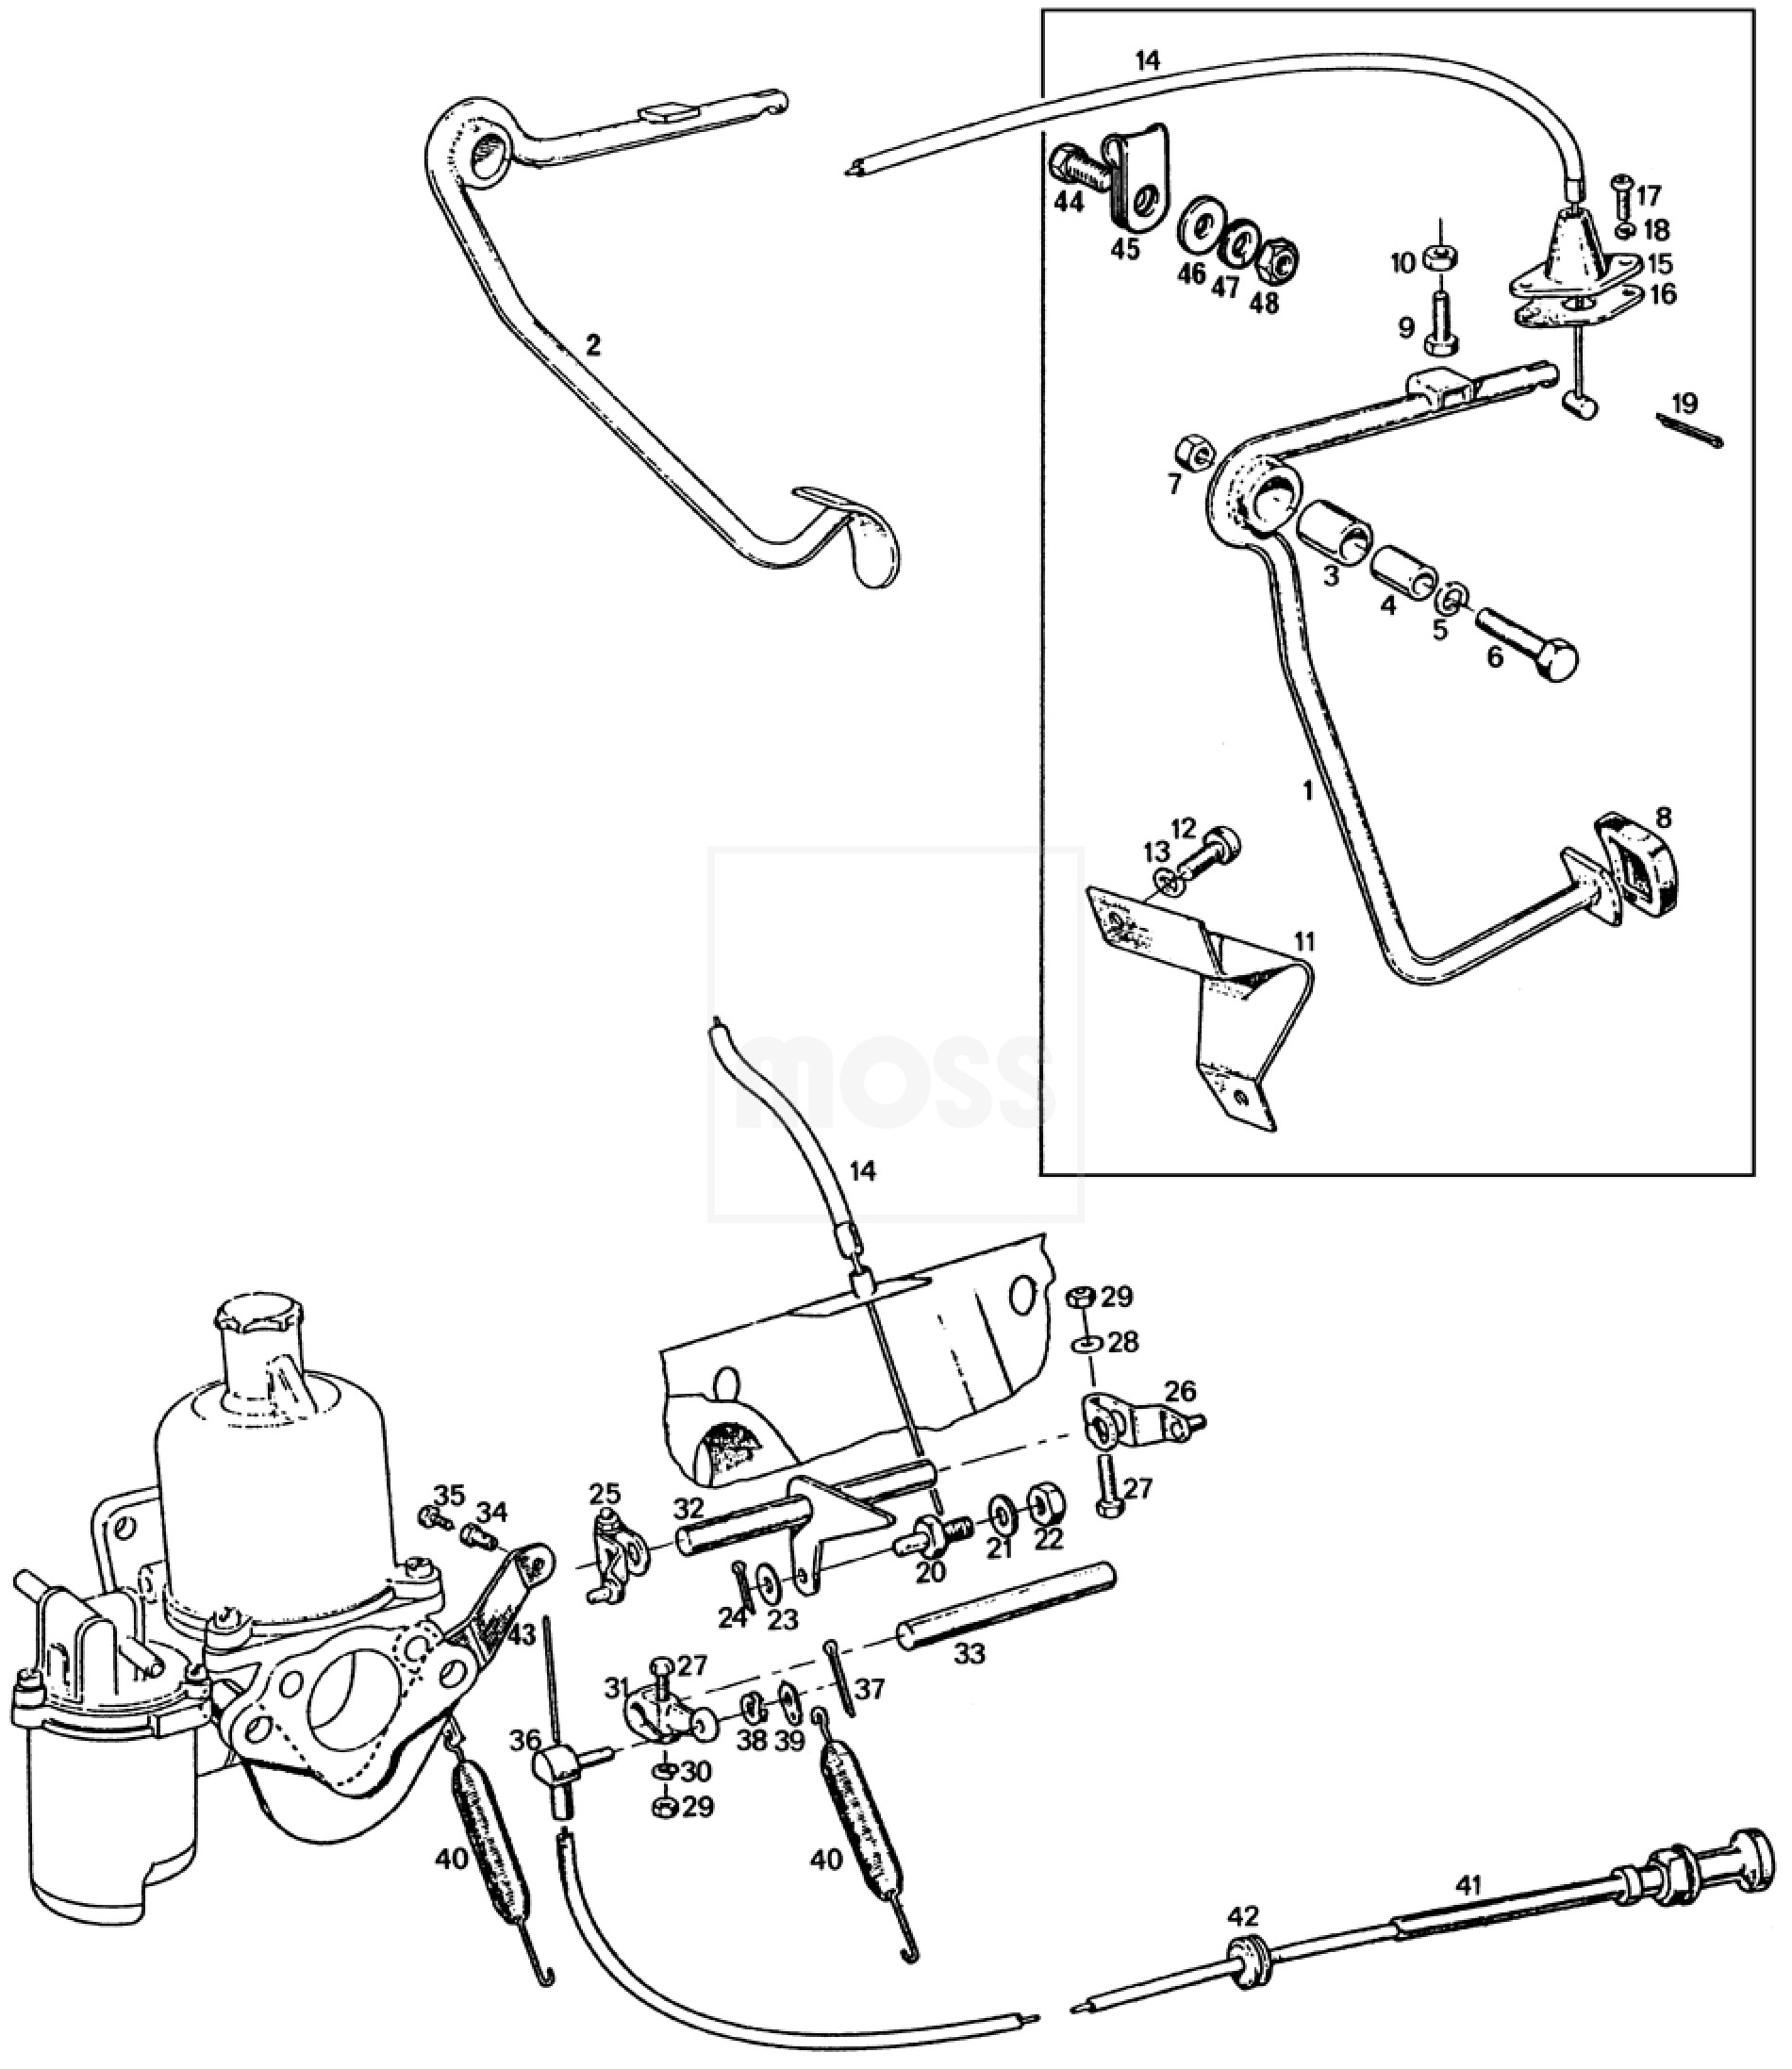 Engine Controls Su Hs4 Carburettors